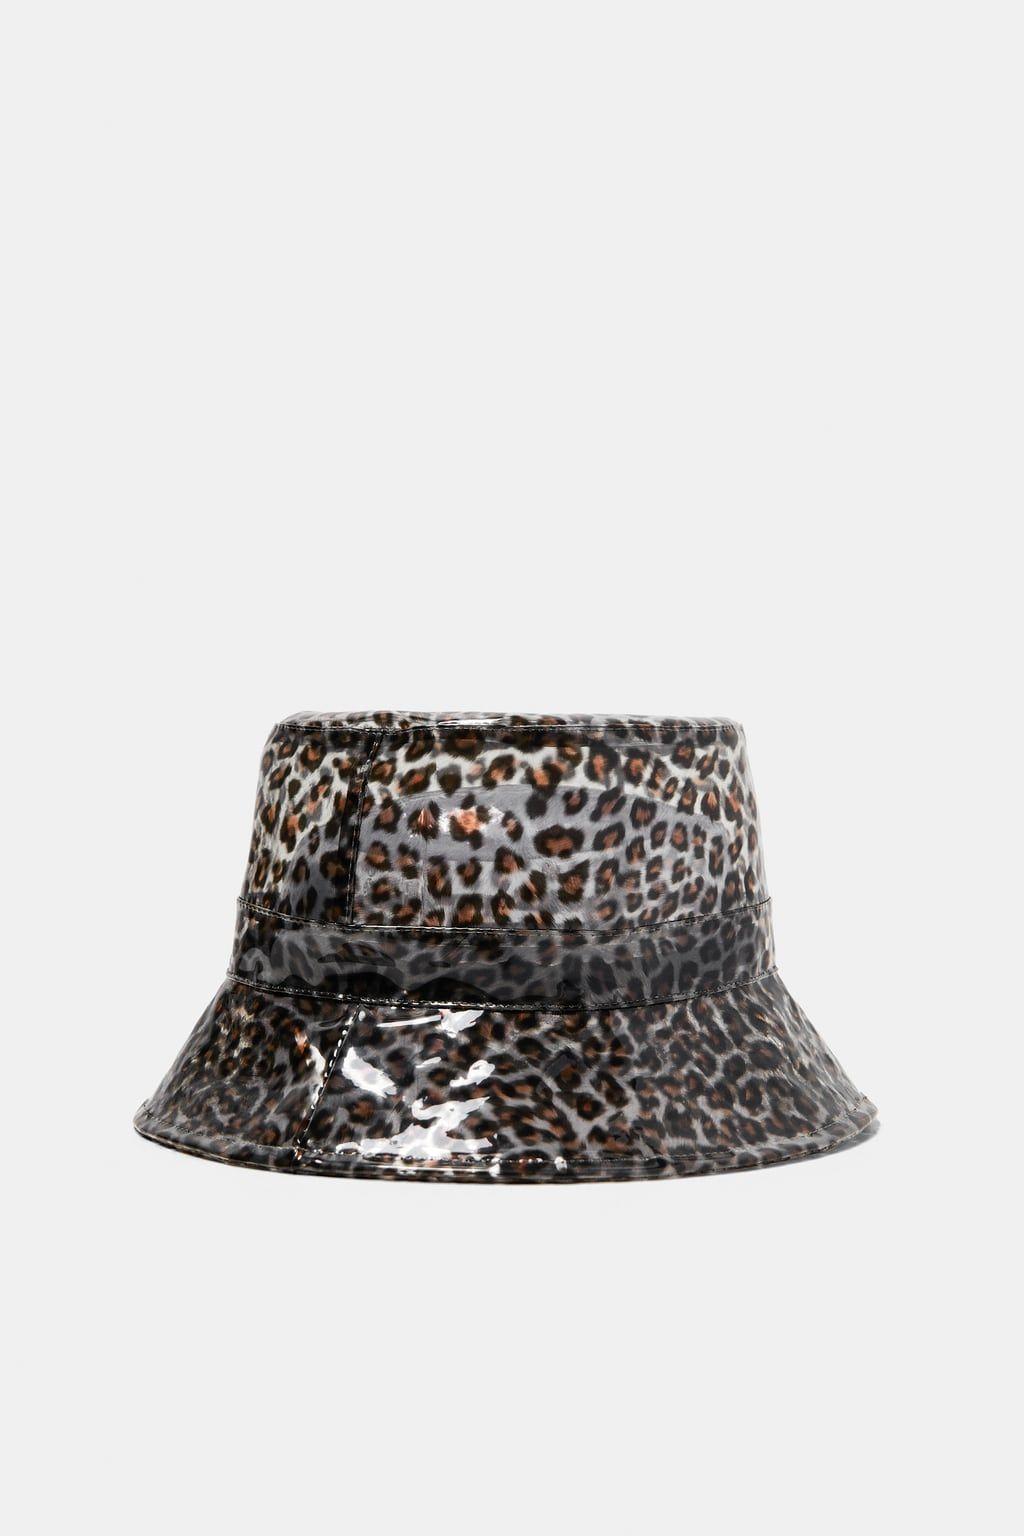 Animal Print Rain Hat Extravagante Hute Hut Susse Hute